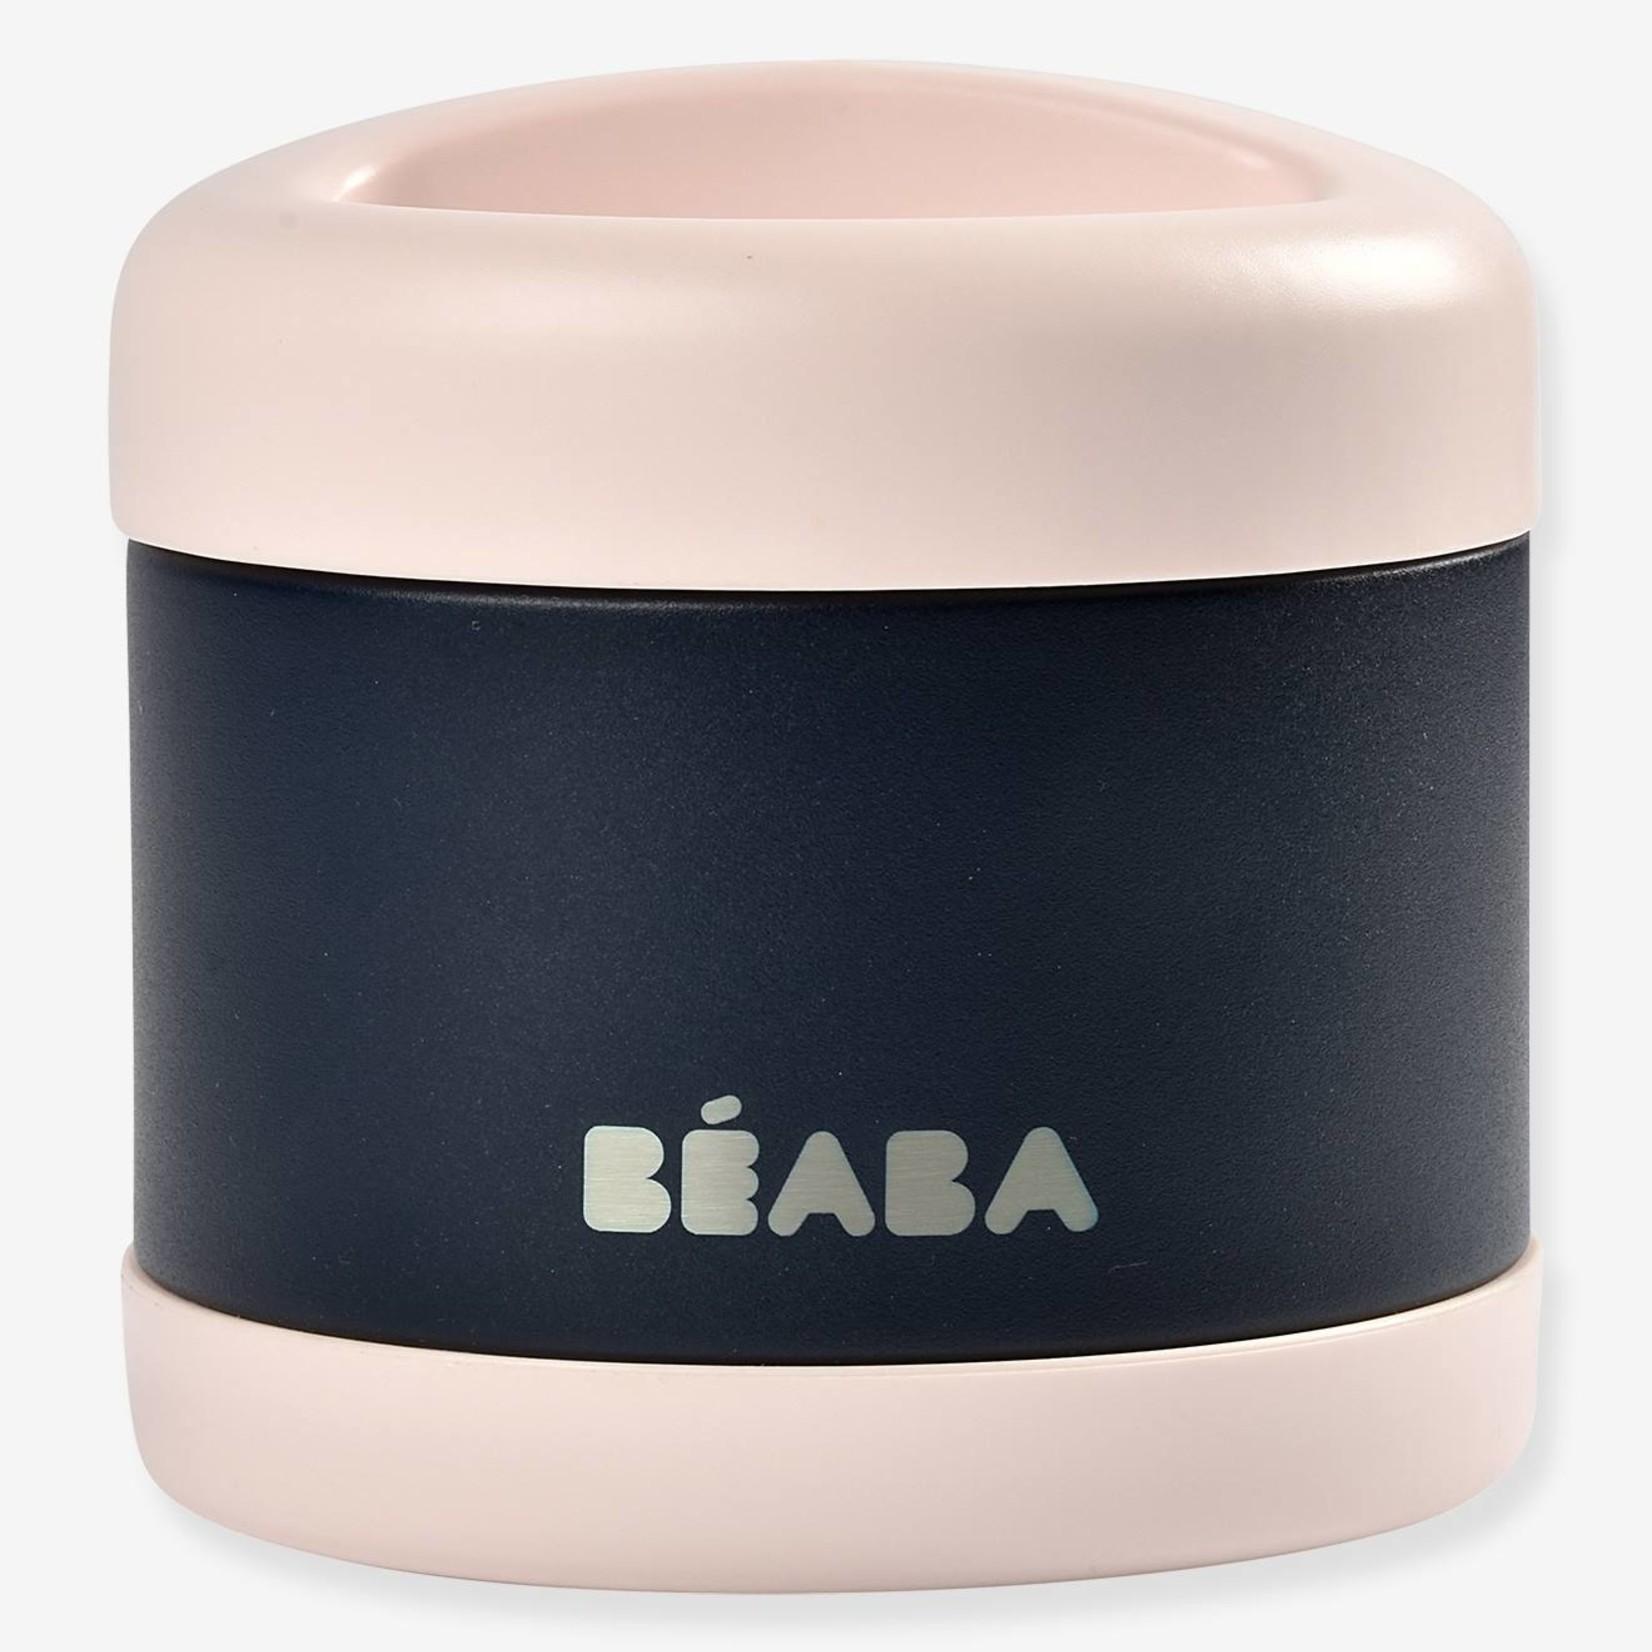 Beaba Beaba Foodjar 500ml Light pink/ Night blue